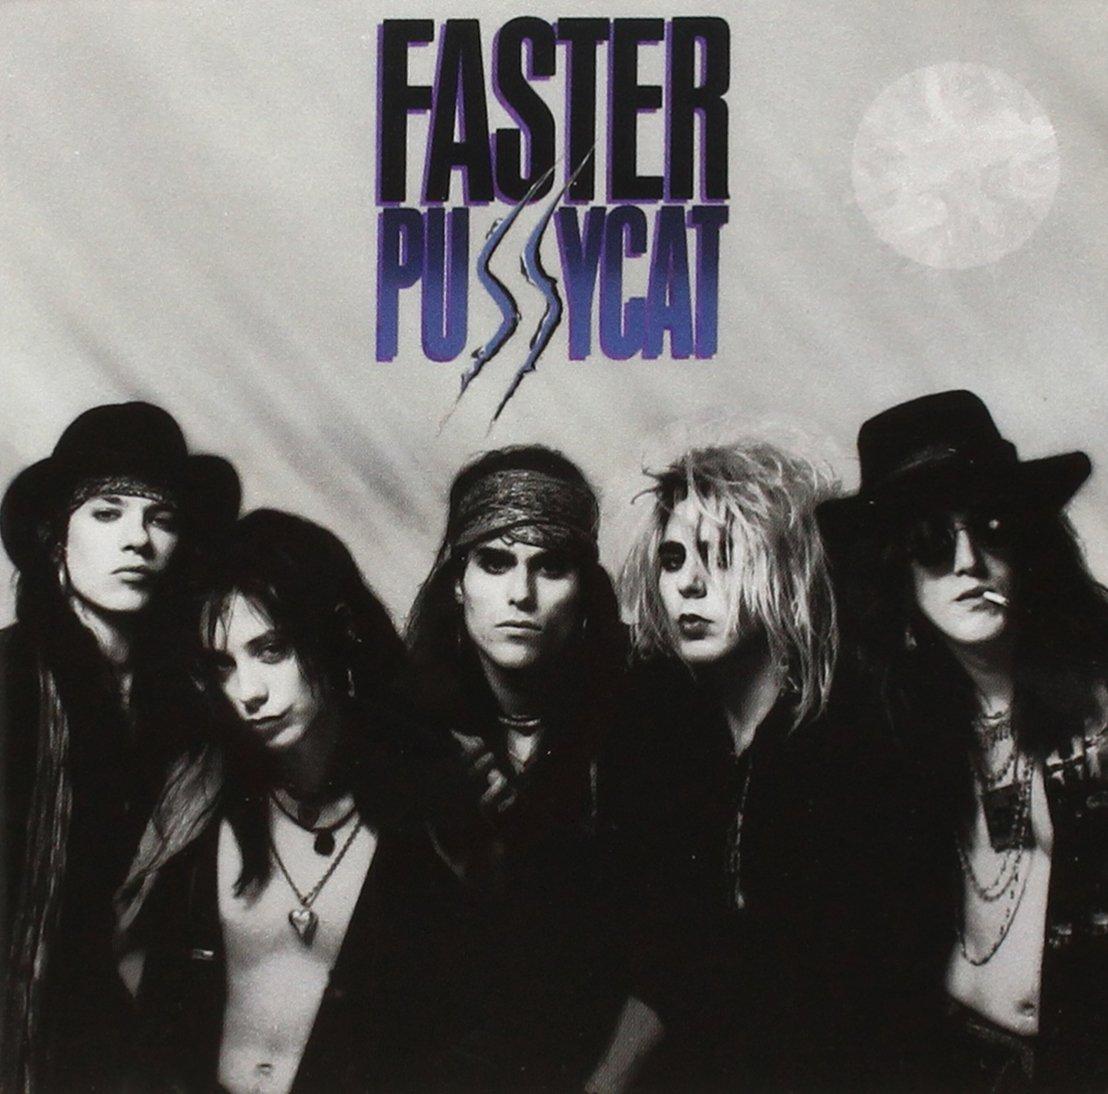 Faster Pussycat